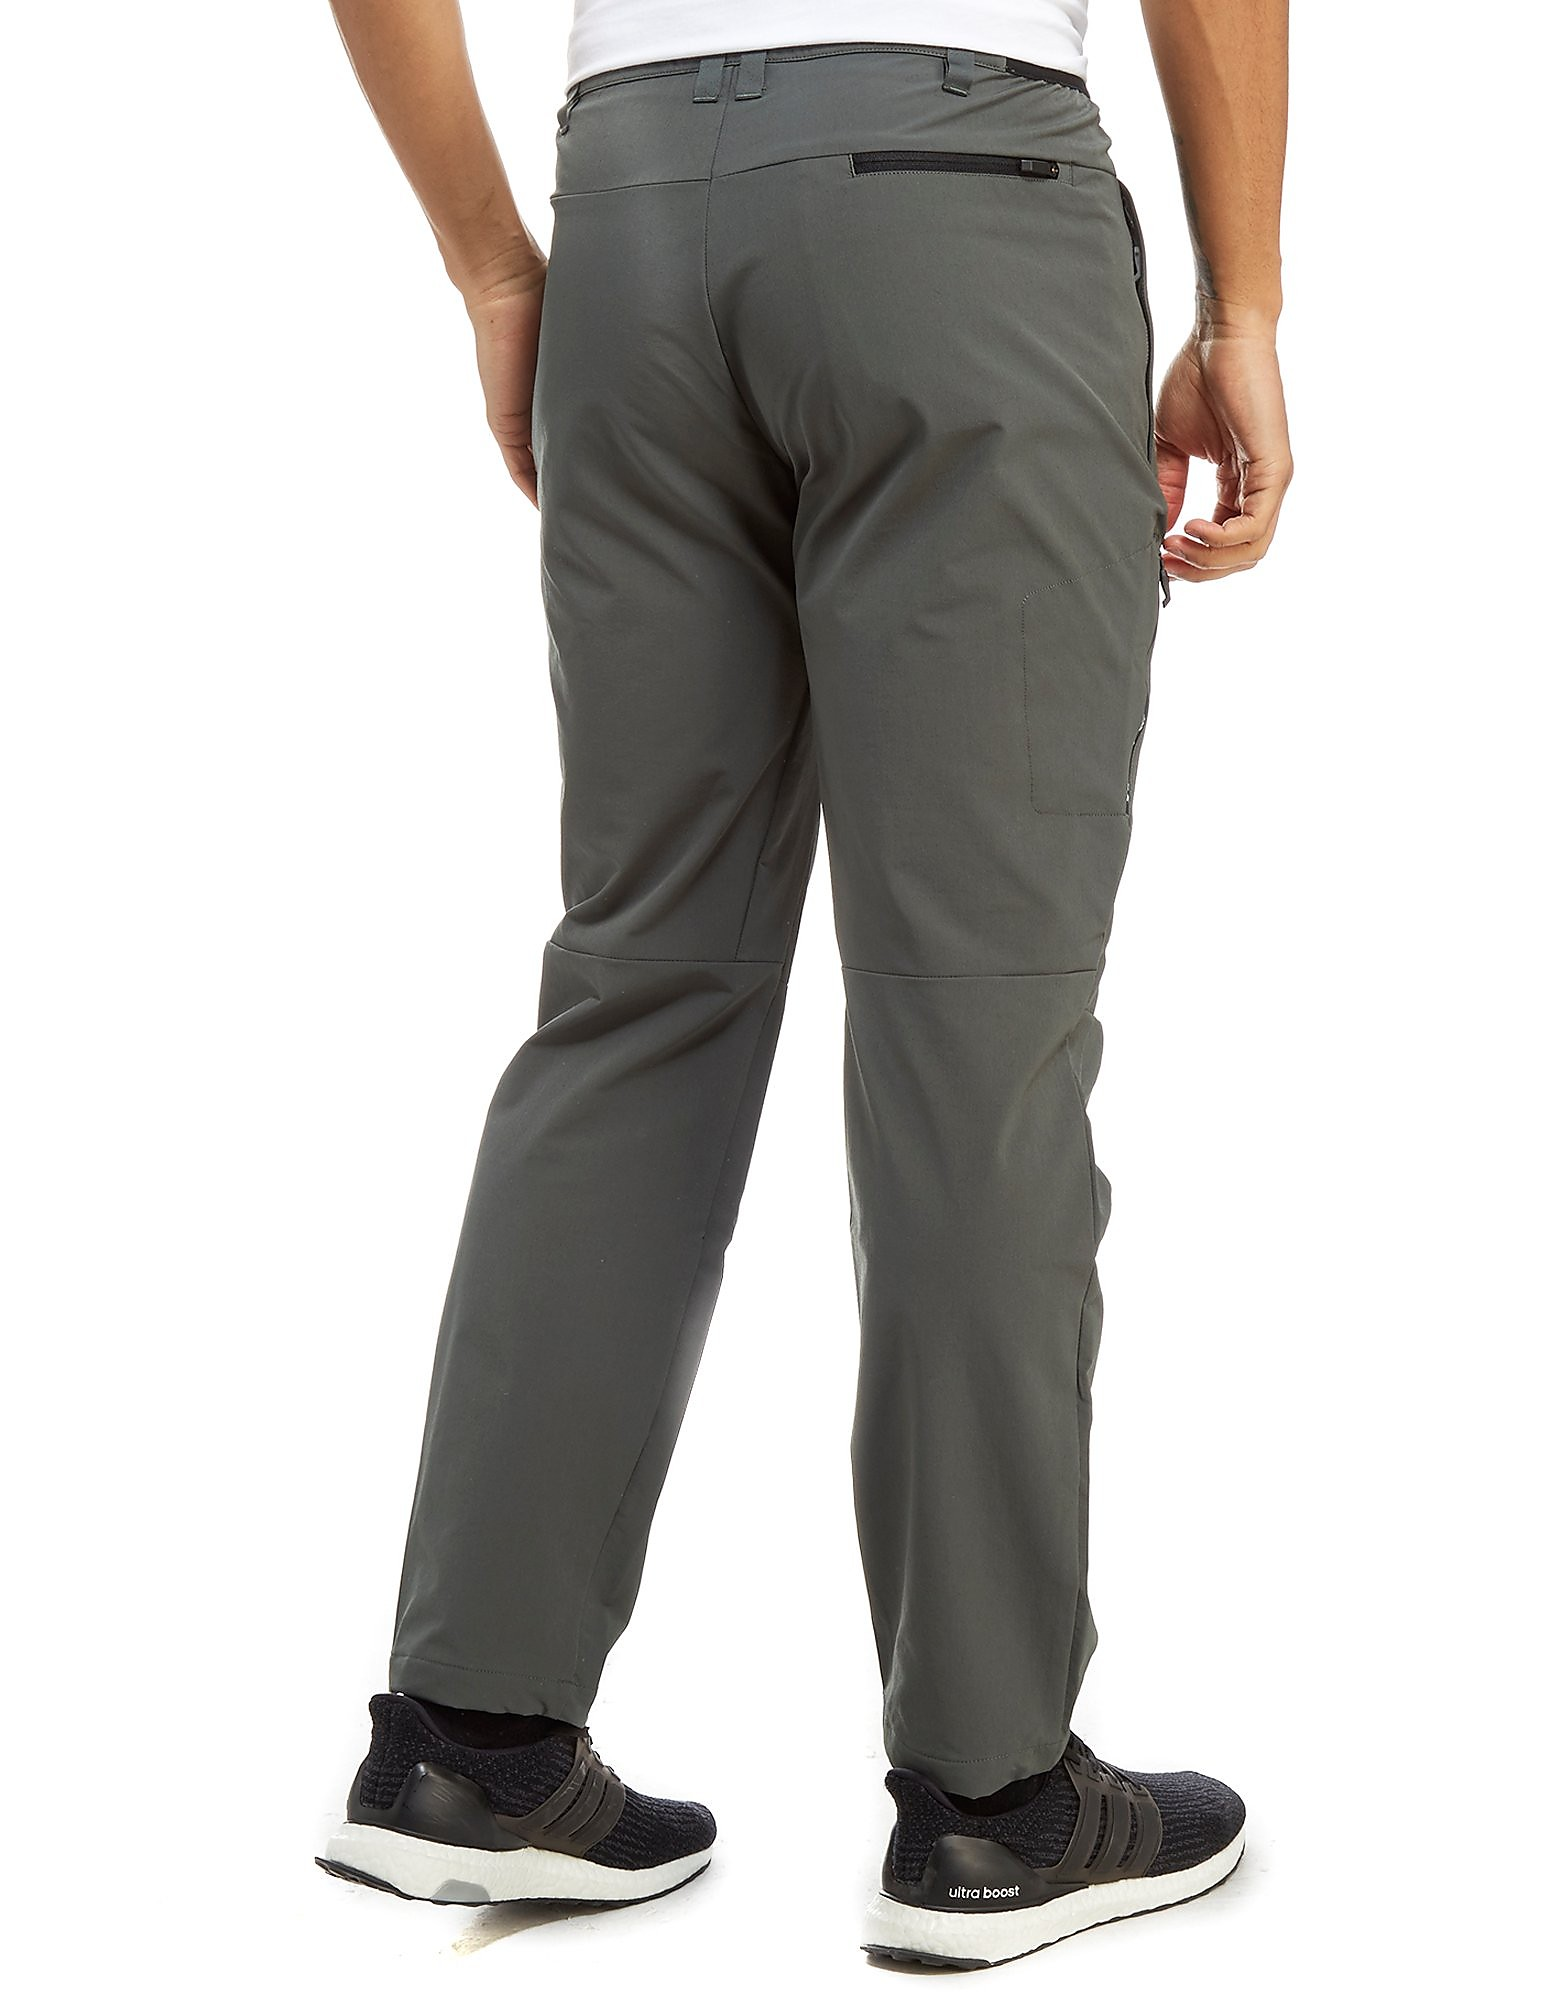 adidas All Seasons Pants